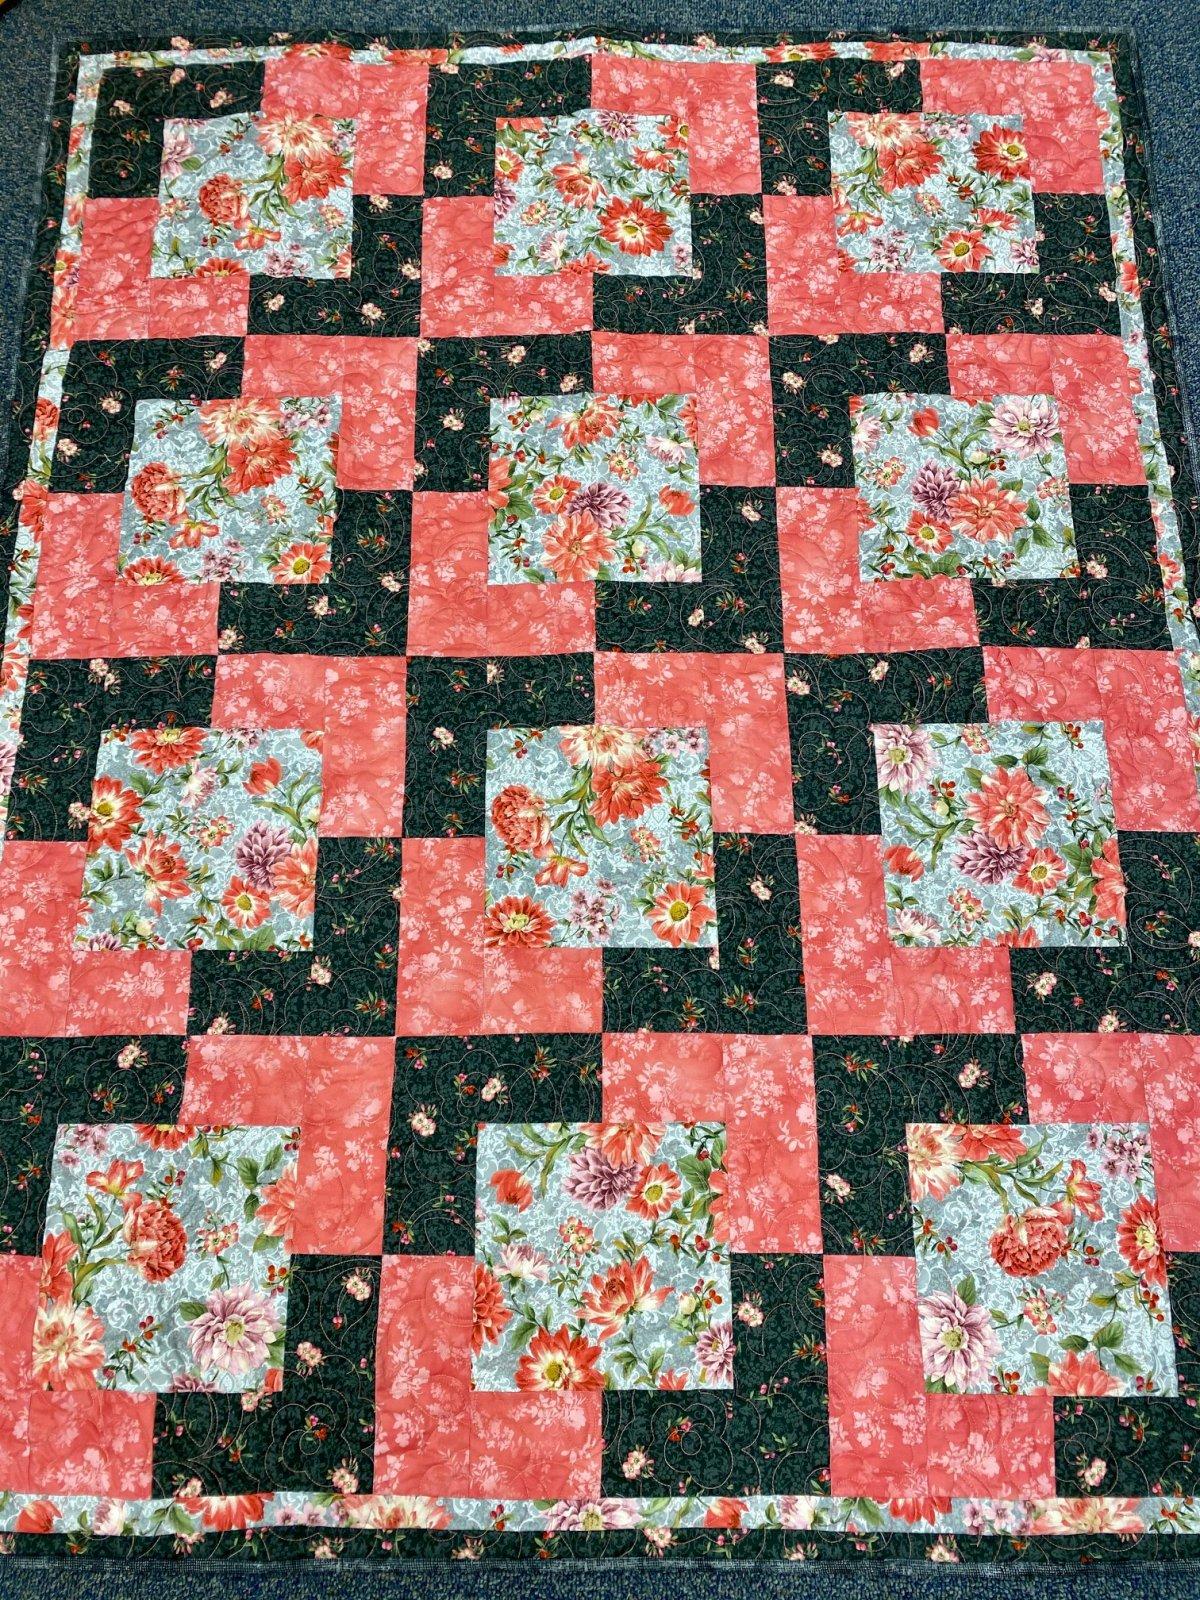 Ready Made Floral Throw Quilt - Handmade using Robert Kaufman Fabrics by Cotton Candy Fabrics